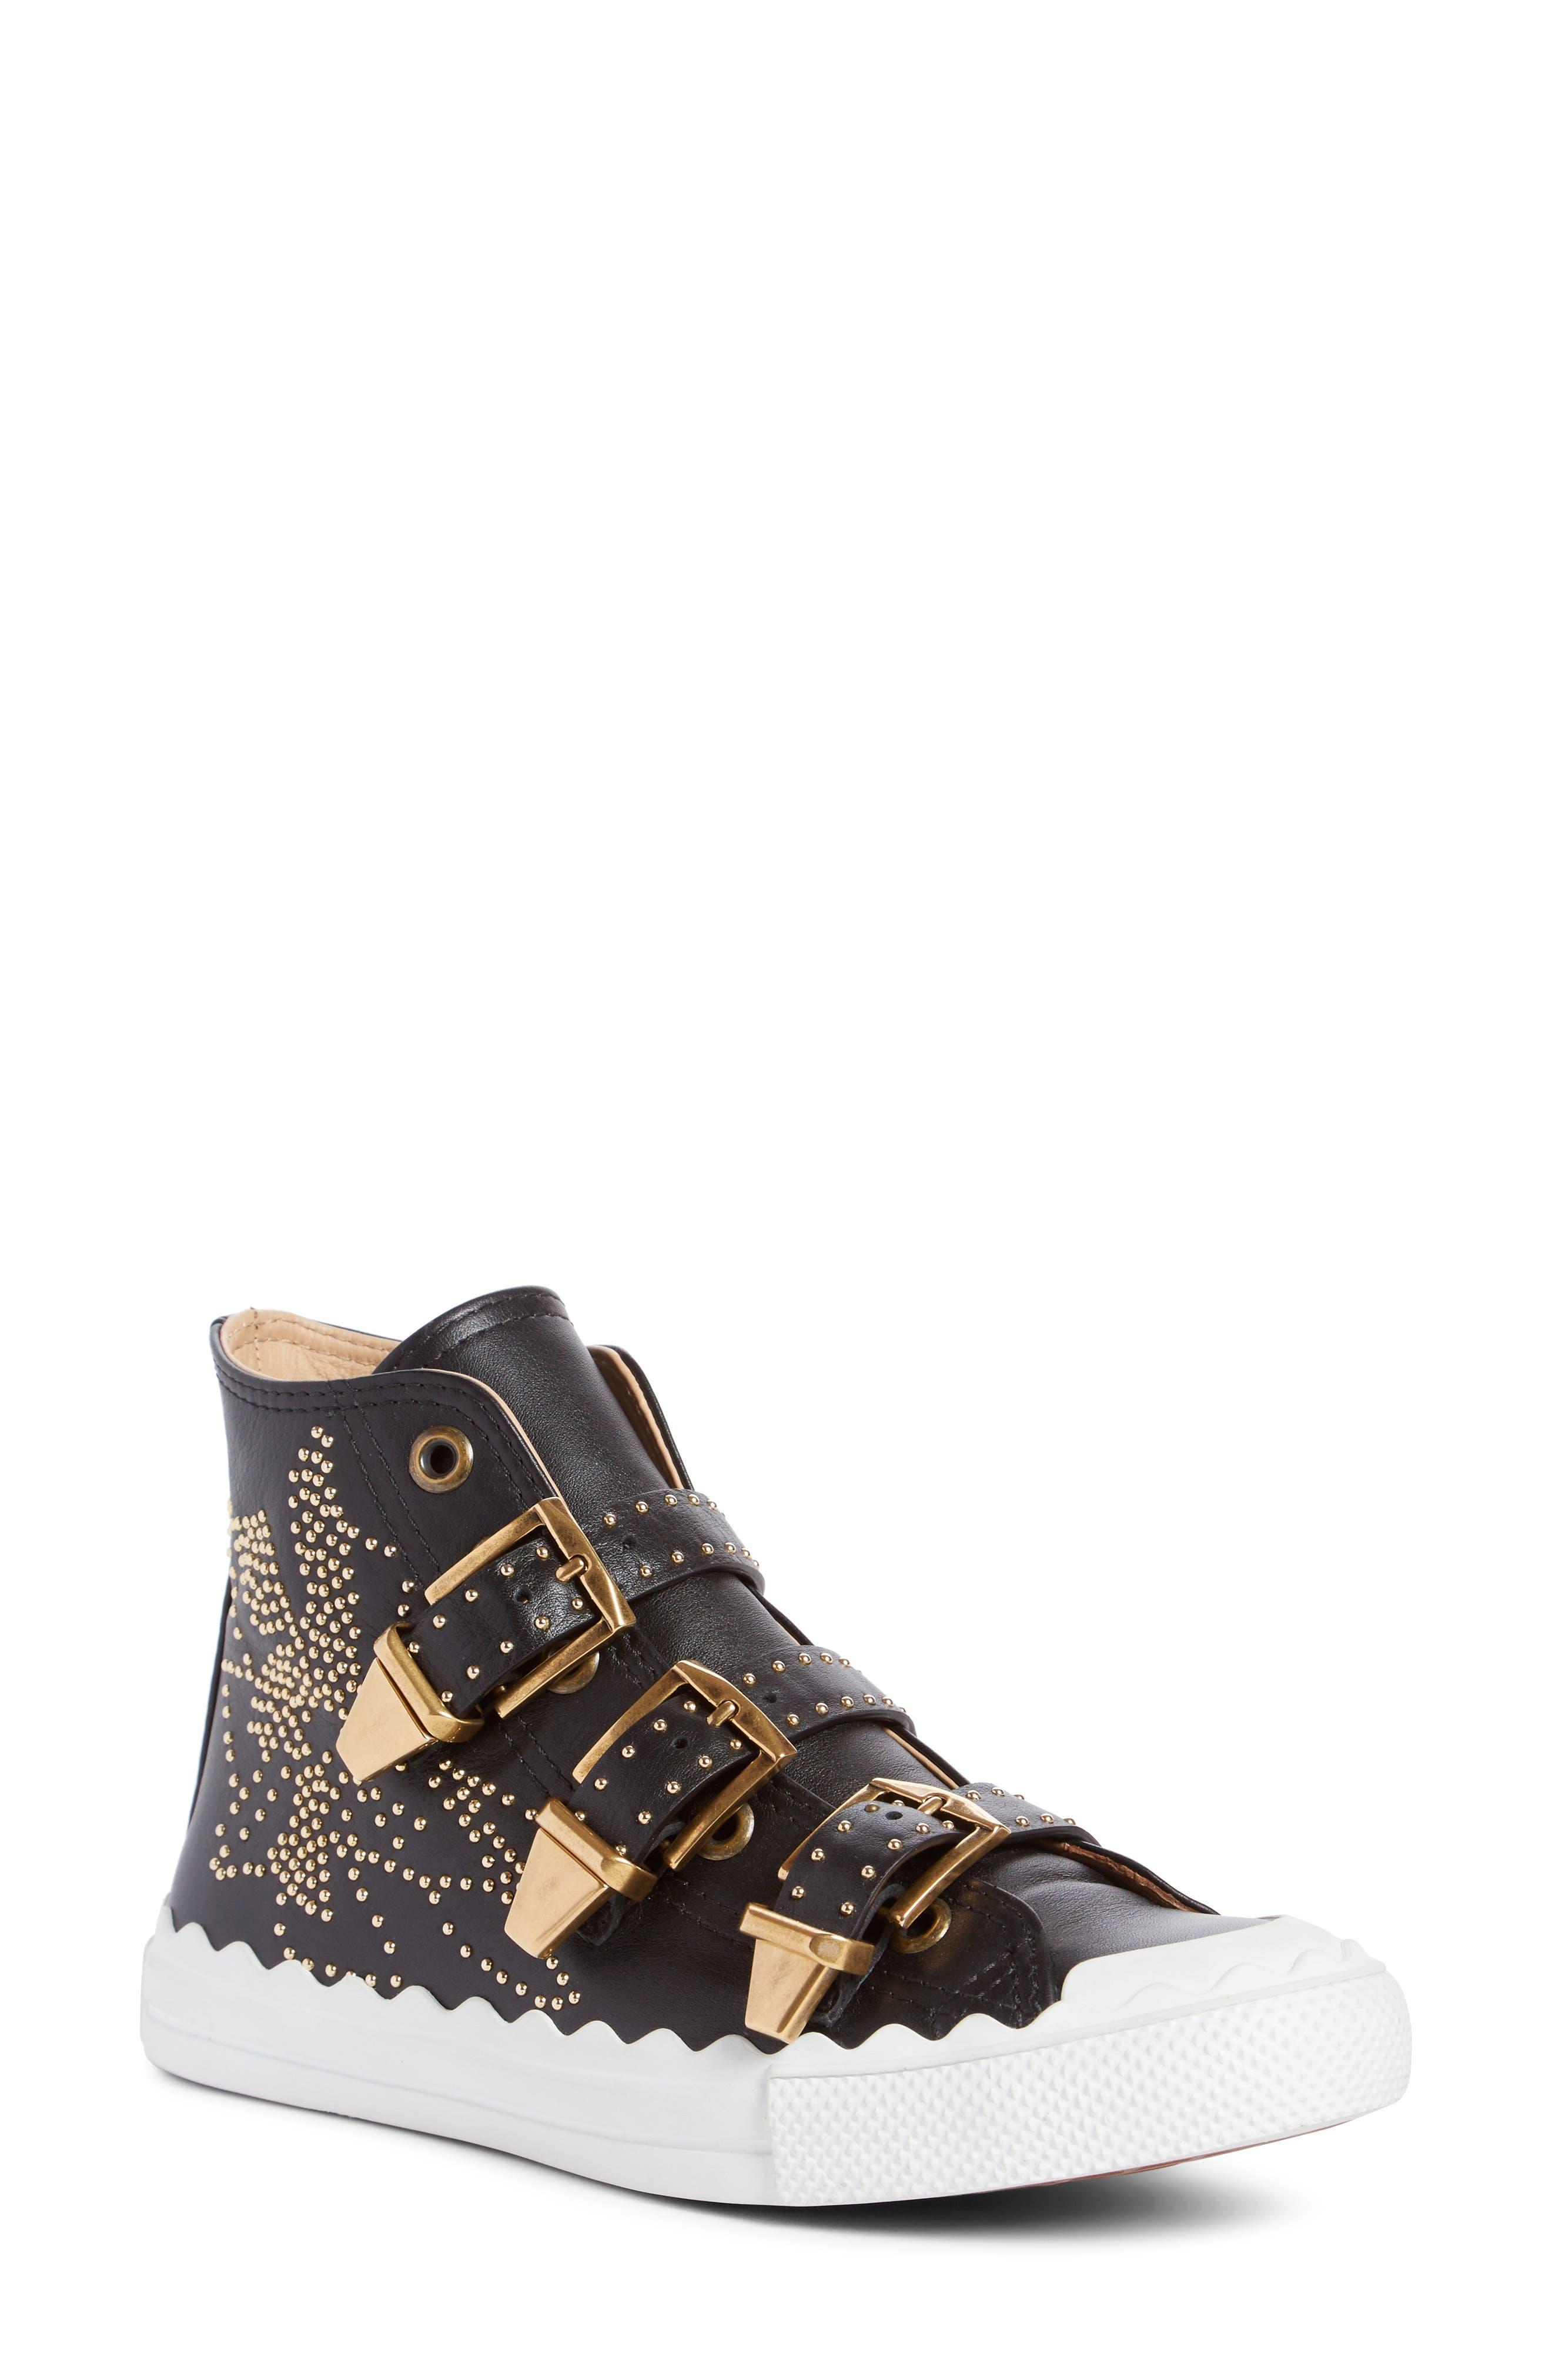 Chloé Kyle Stud Buckle High Top Sneaker (Women)